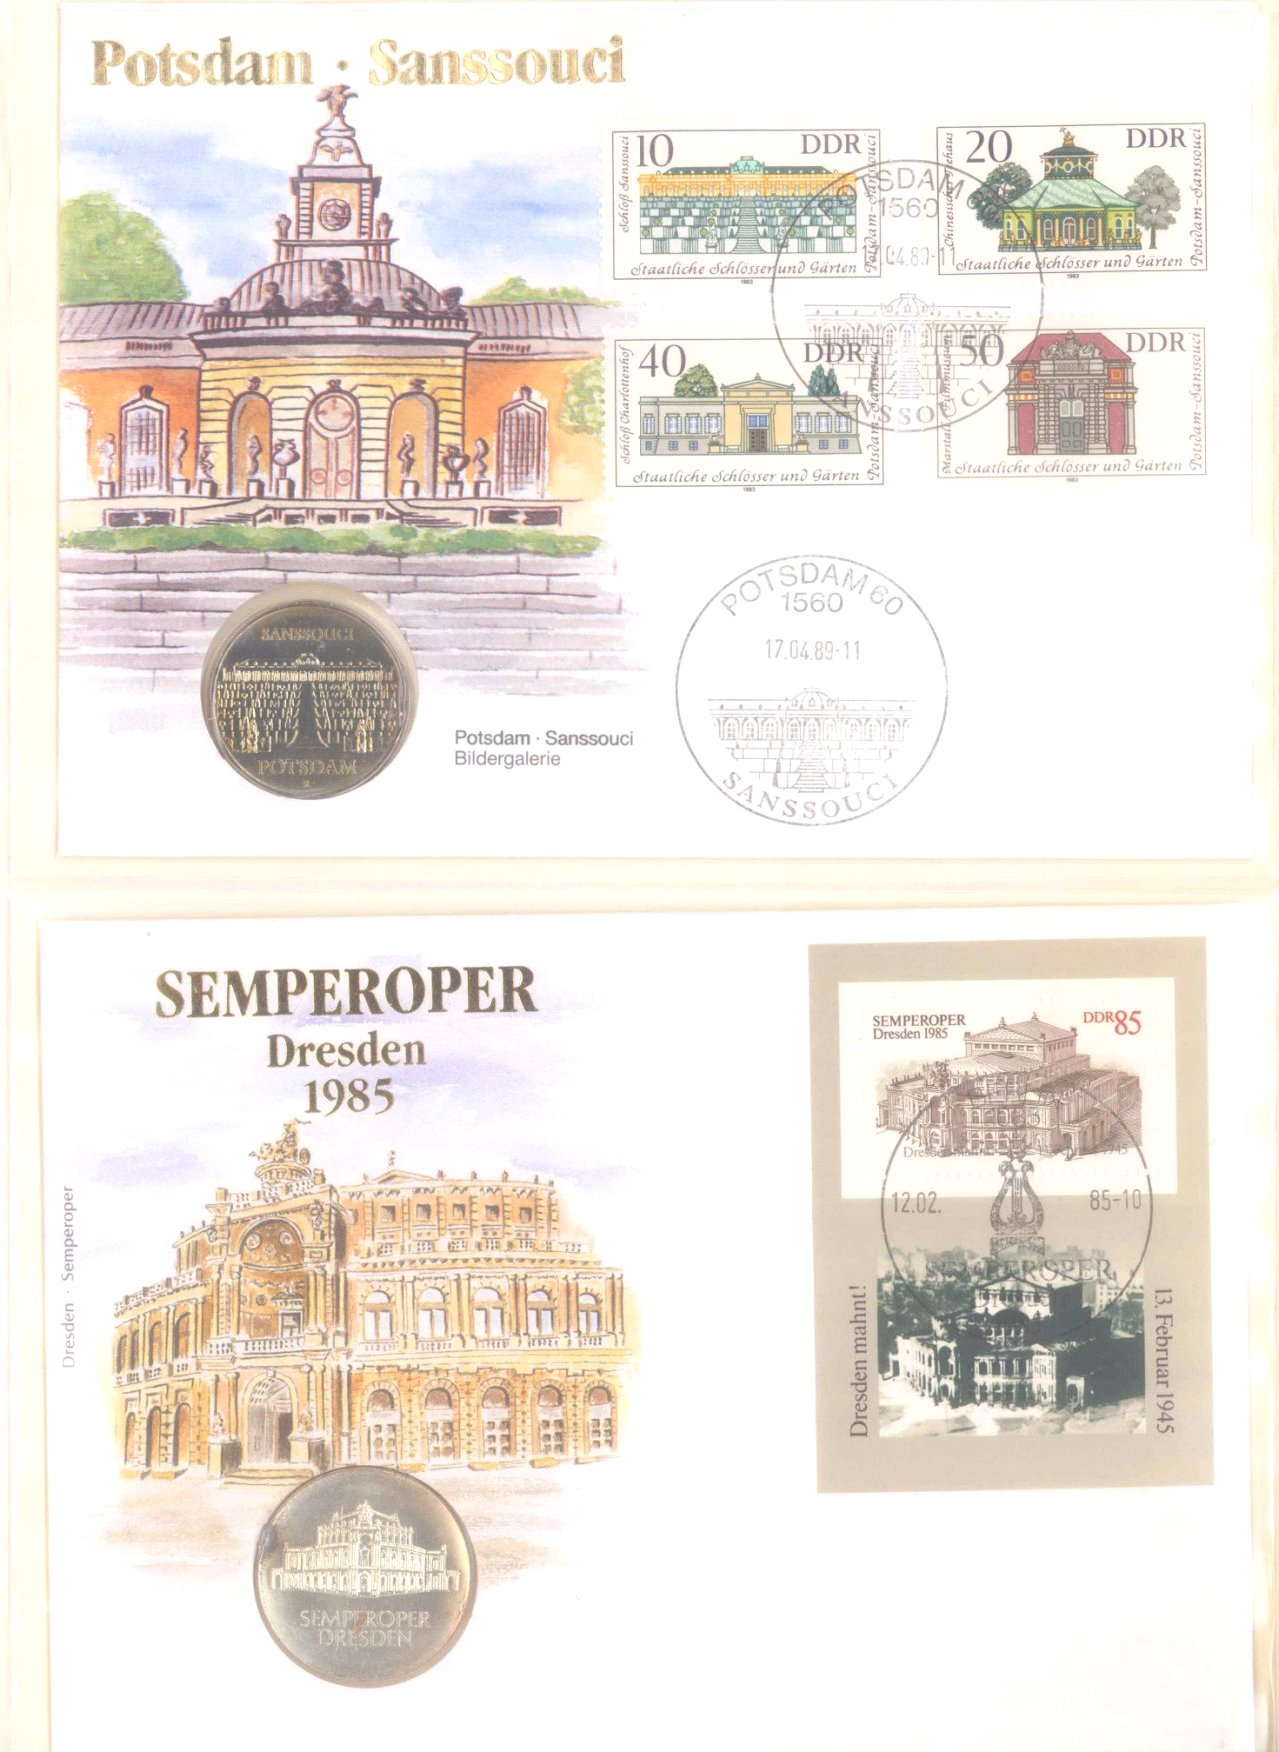 Sammlung Borek Numisbriefe im Ringbinder-3